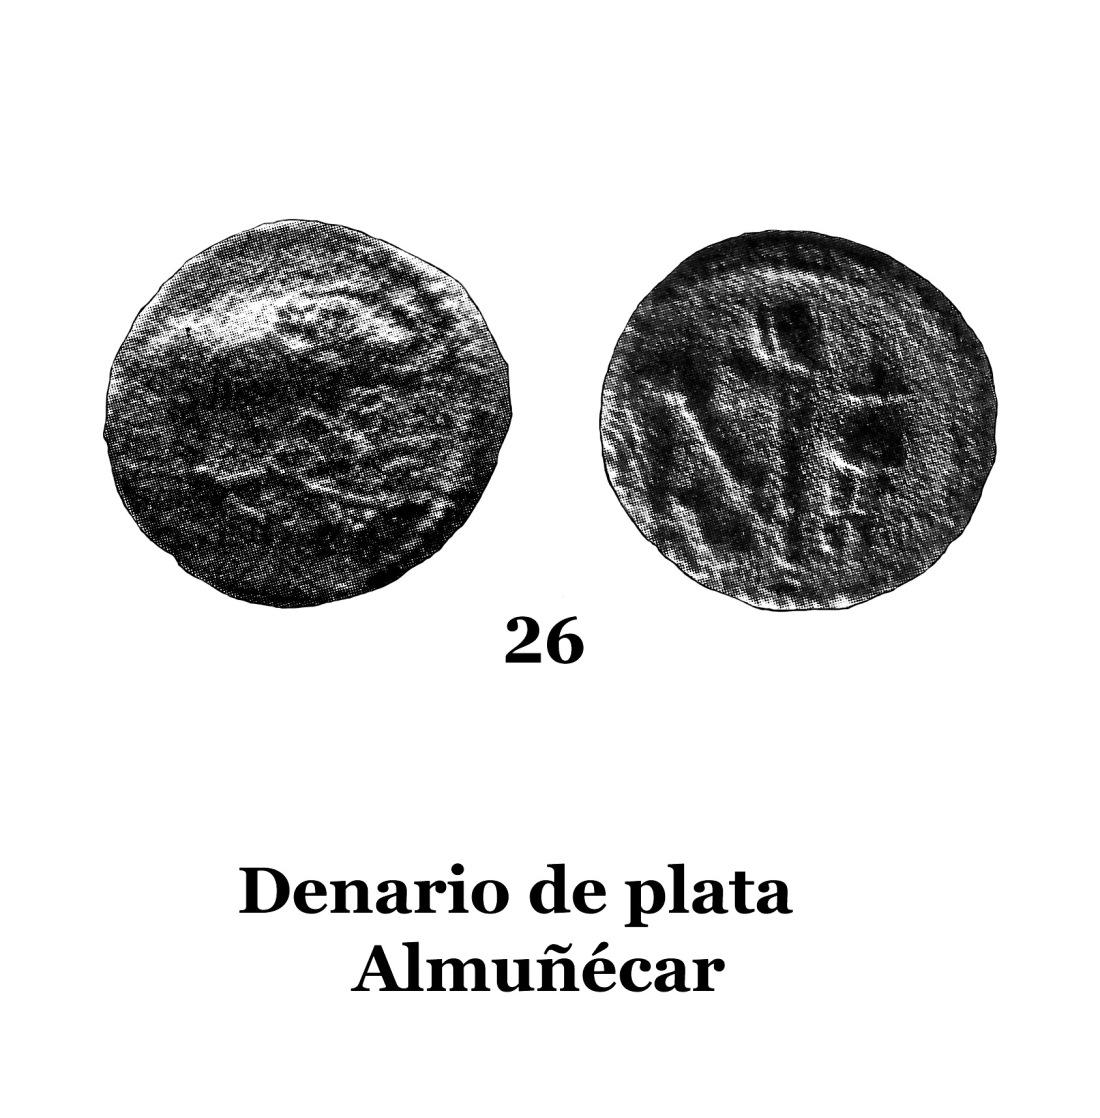 26Denario de plata de Almuñécar 26